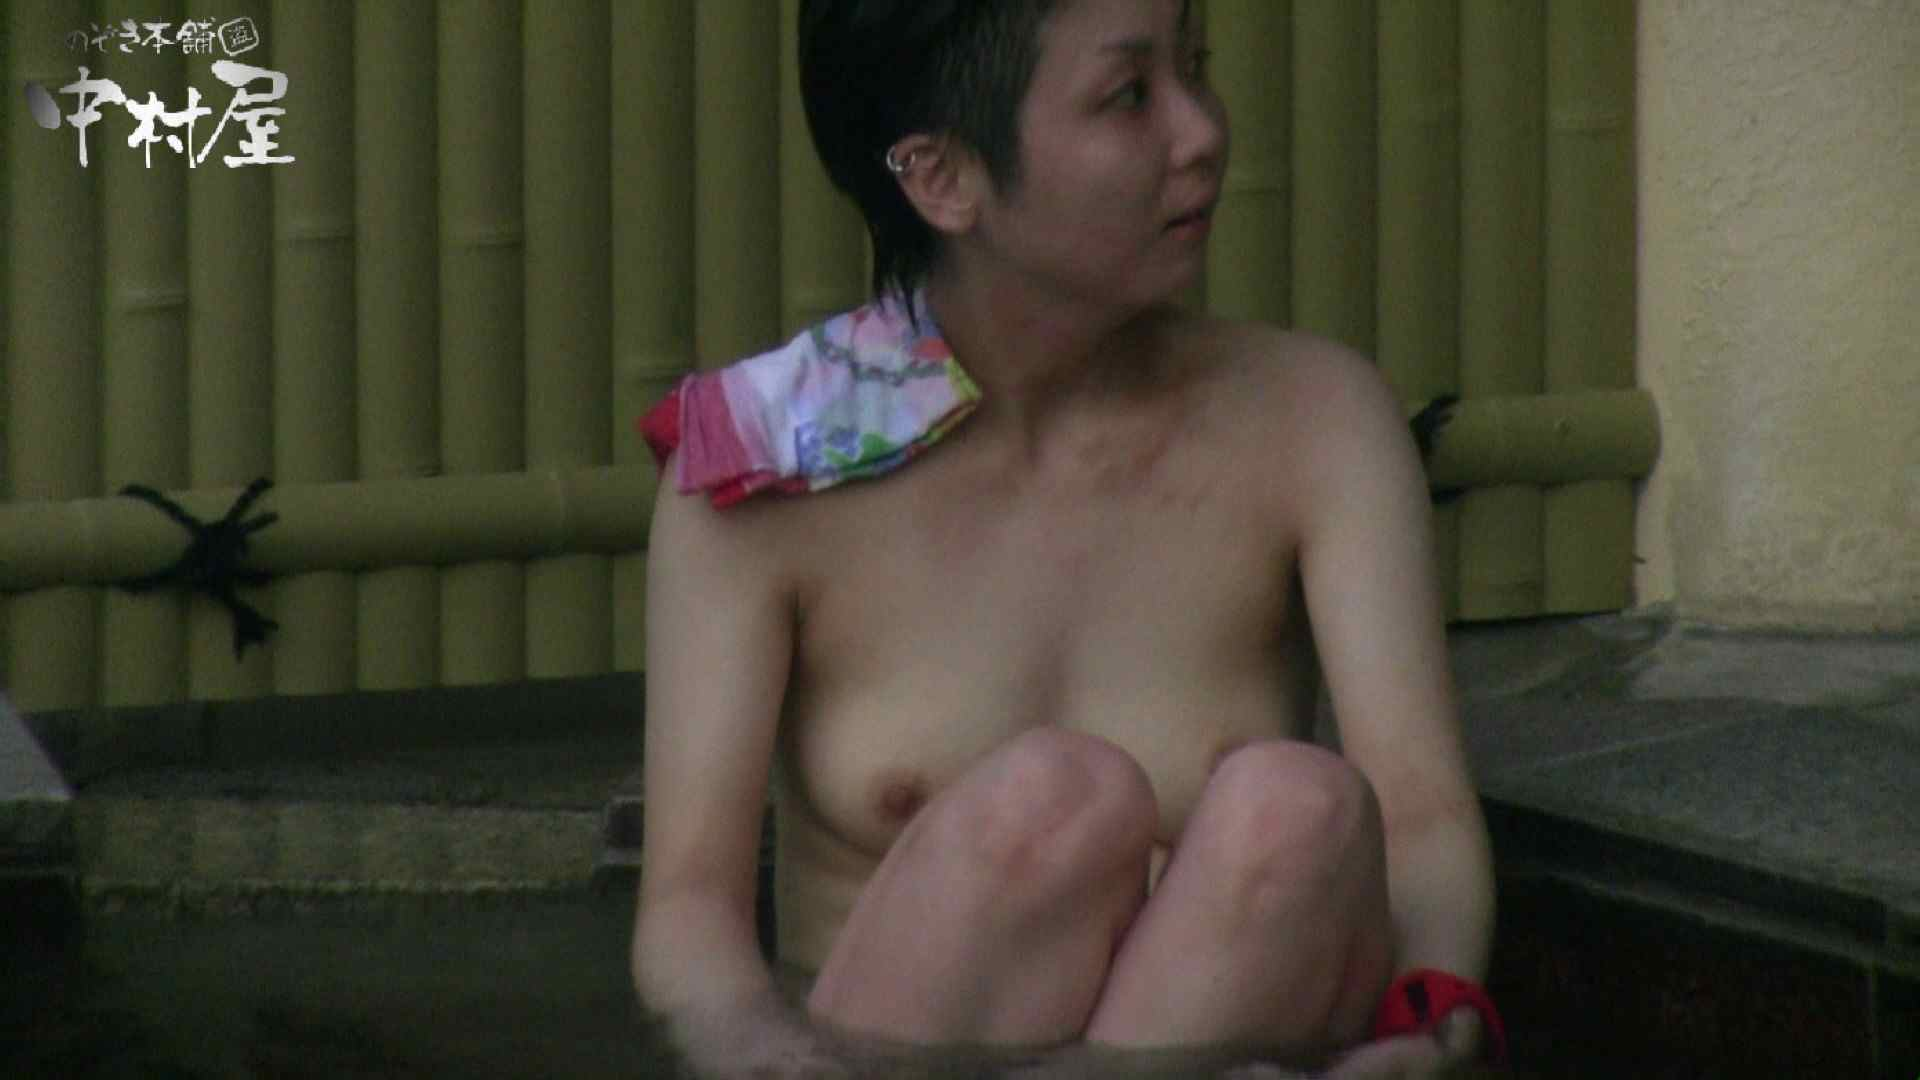 Aquaな露天風呂Vol.884 露天風呂突入 ワレメ動画紹介 92pic 5